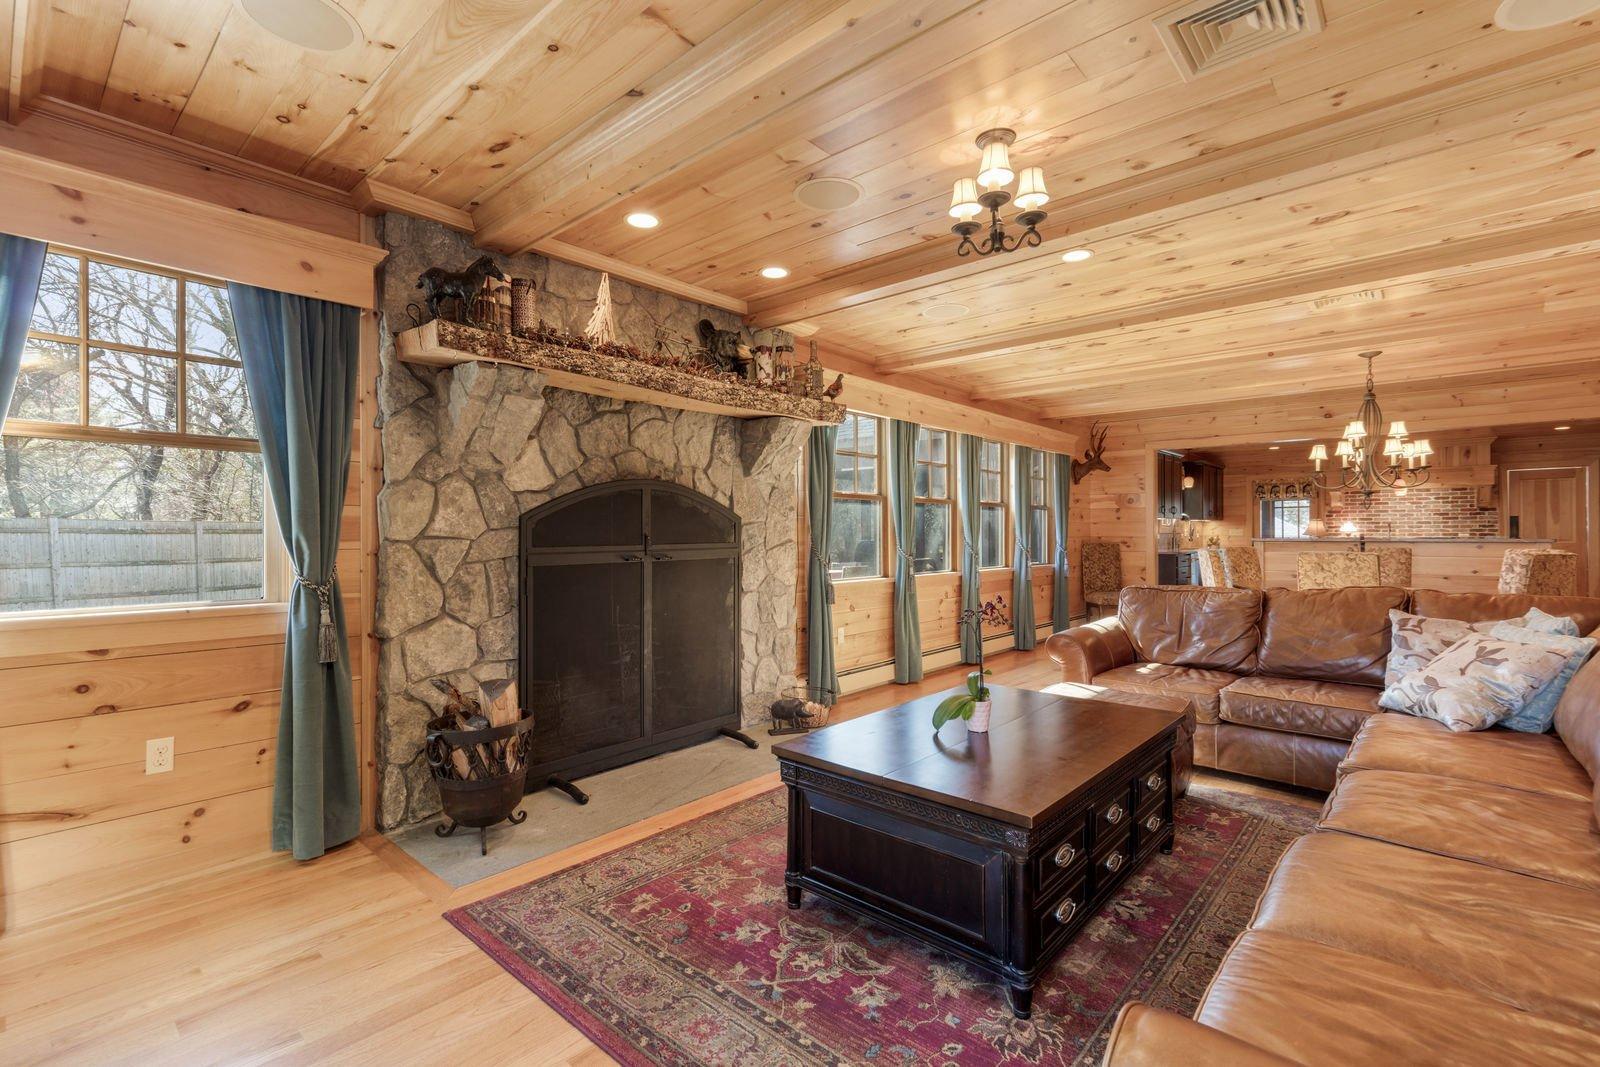 Medium Hardwood Floor, Living Room, and Ceiling Lighting  Shingle Style Rustic Chic